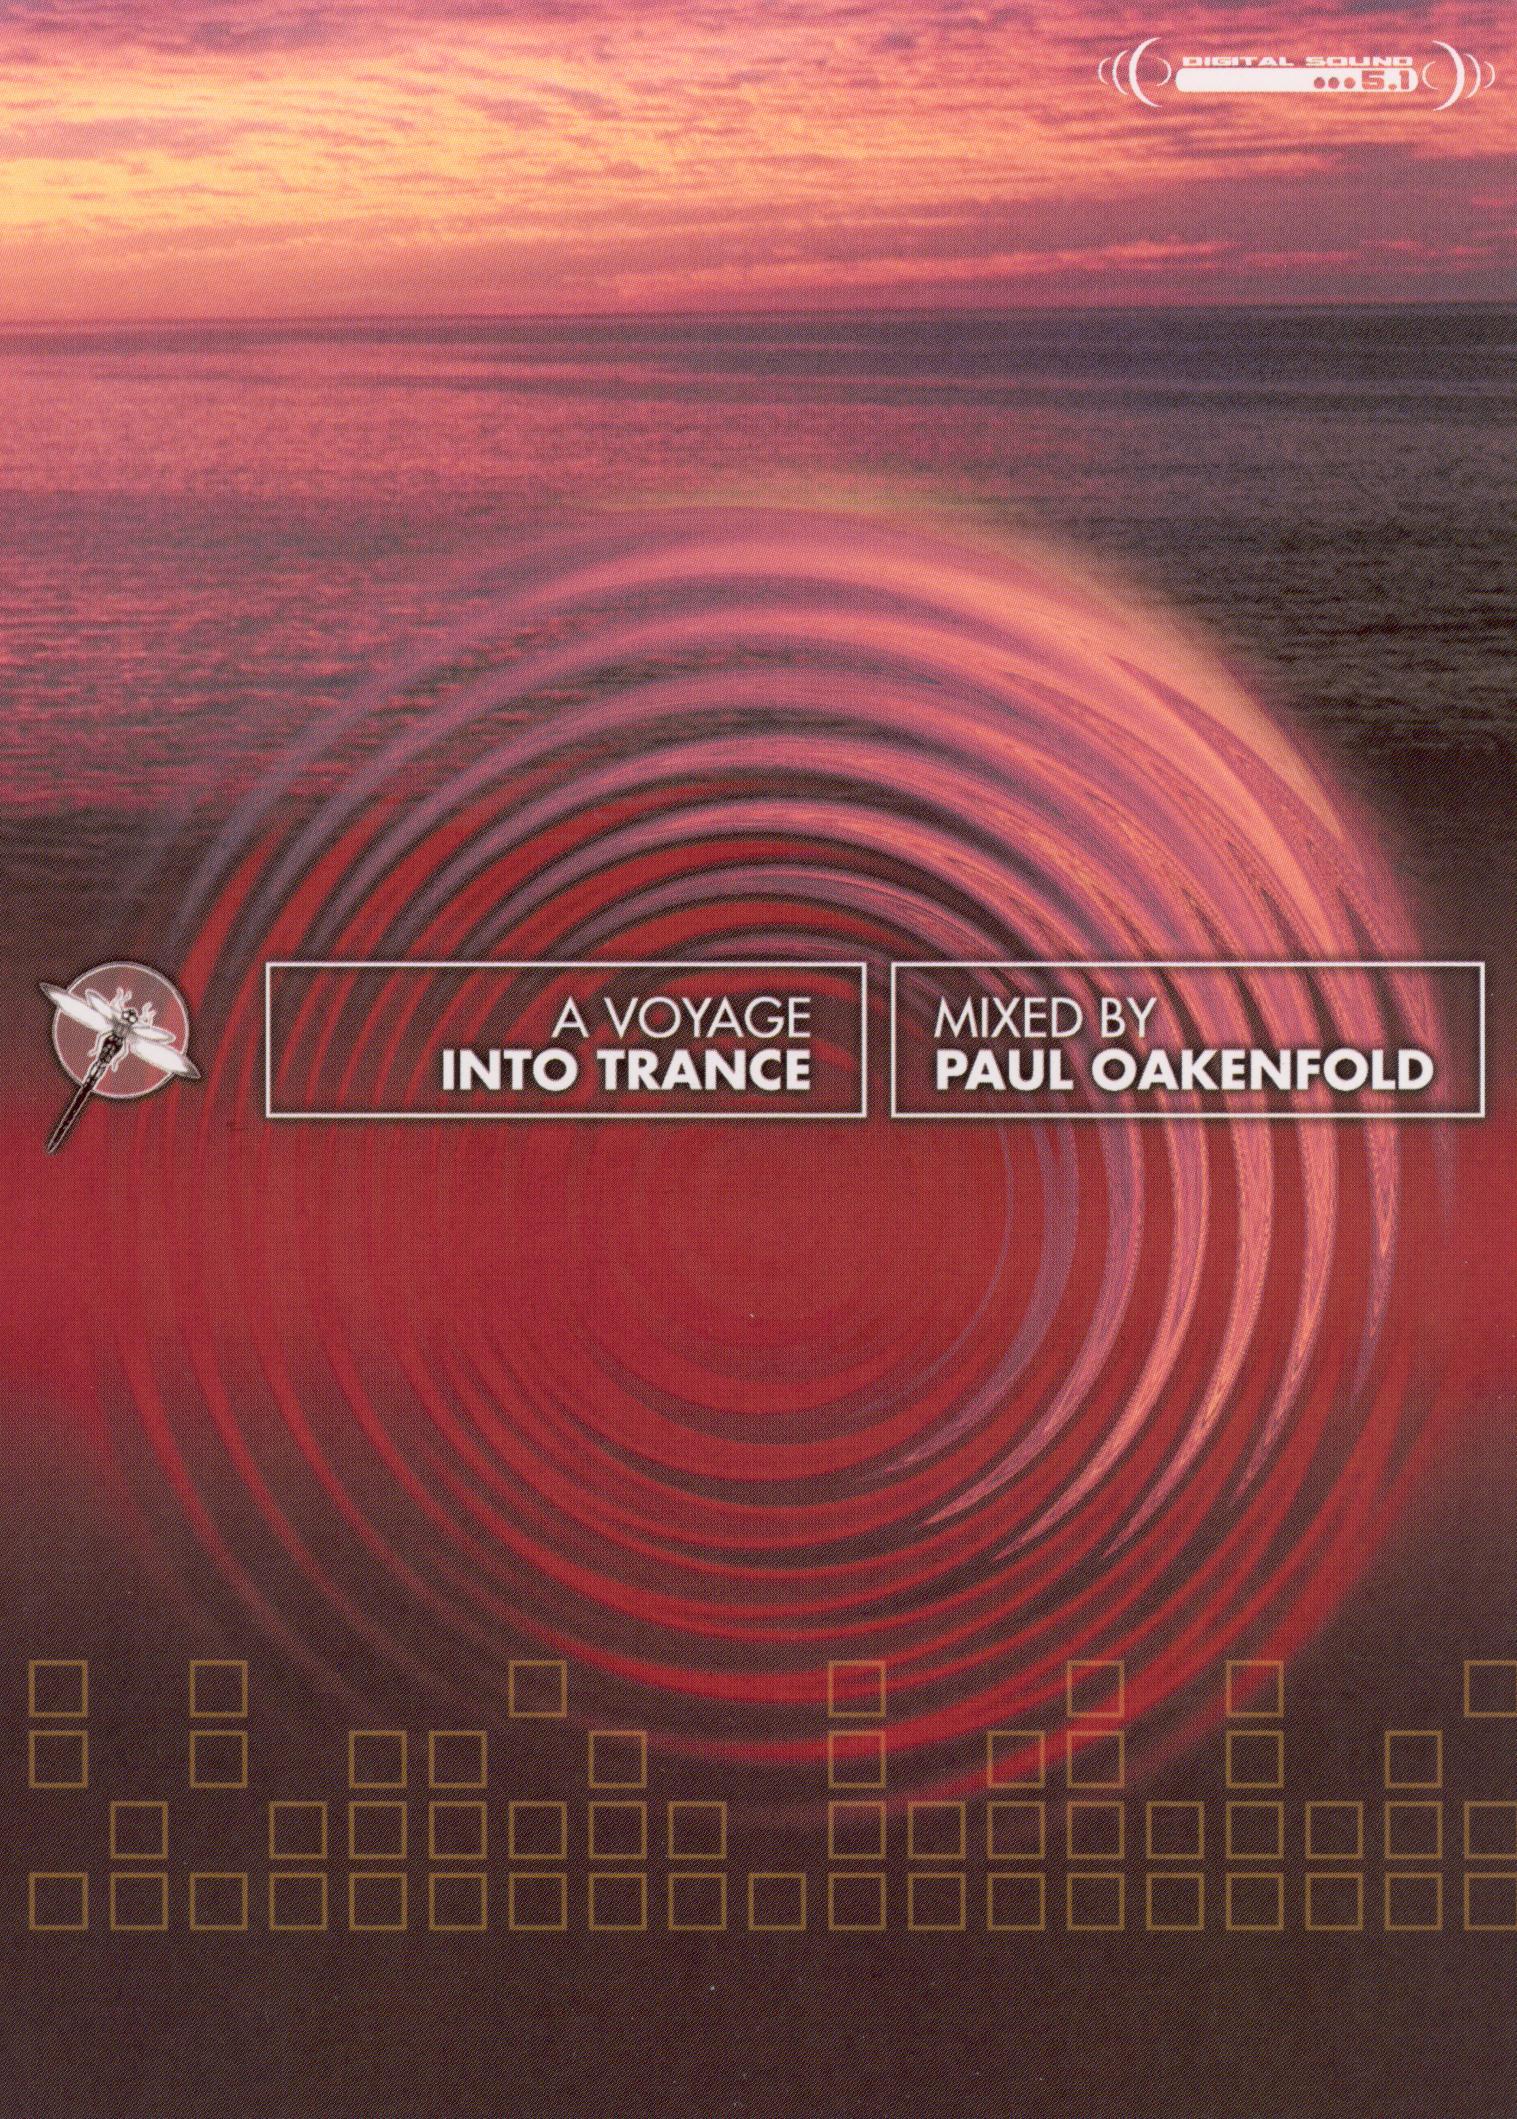 Paul Oakenfold: A Voyage Into Trance